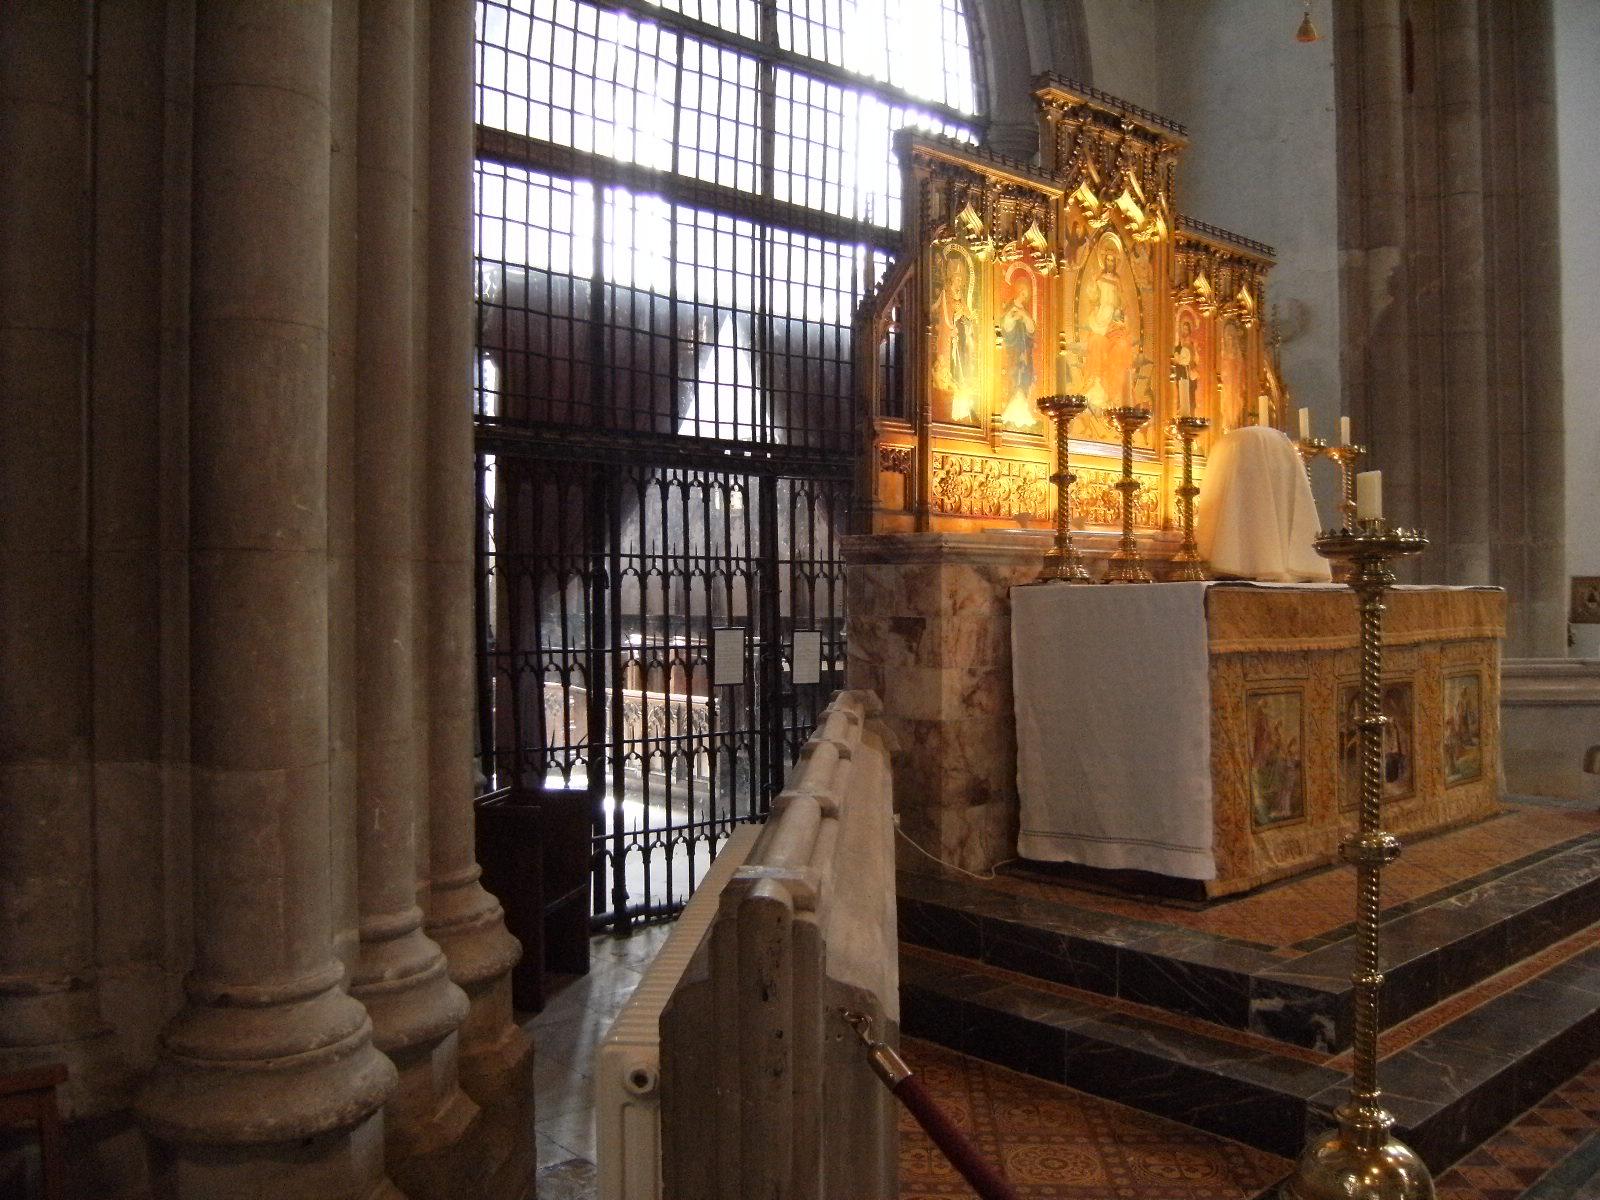 1007190073 Grille separating Fitzalan Chapel inside St Nicholas' Church